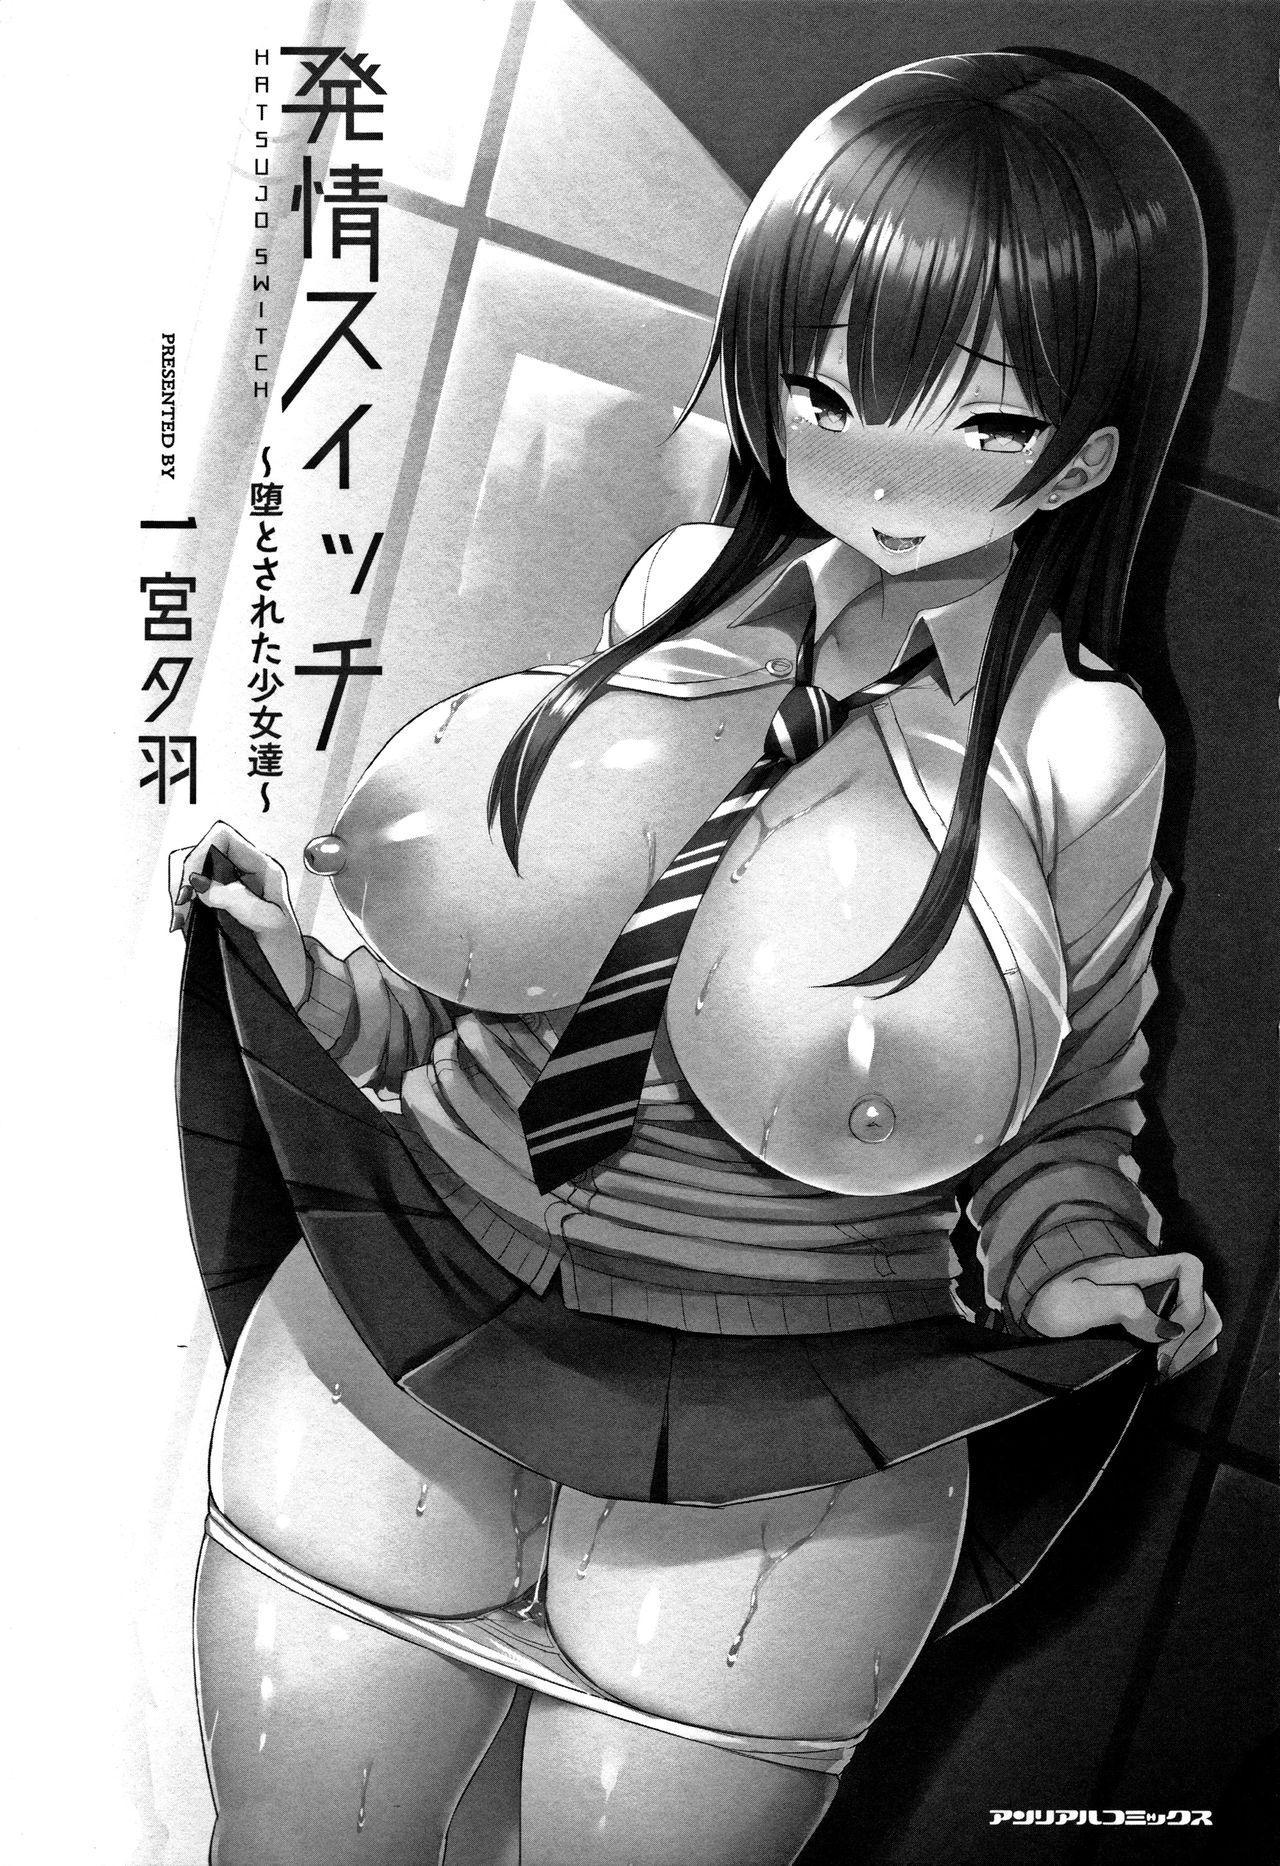 [Ichinomiya Yuu] Hatsujou Switch ~ Otosareta Shoujo-tachi ~   發情啟動開關~墮落下去的少女們~ [Chinese] 5